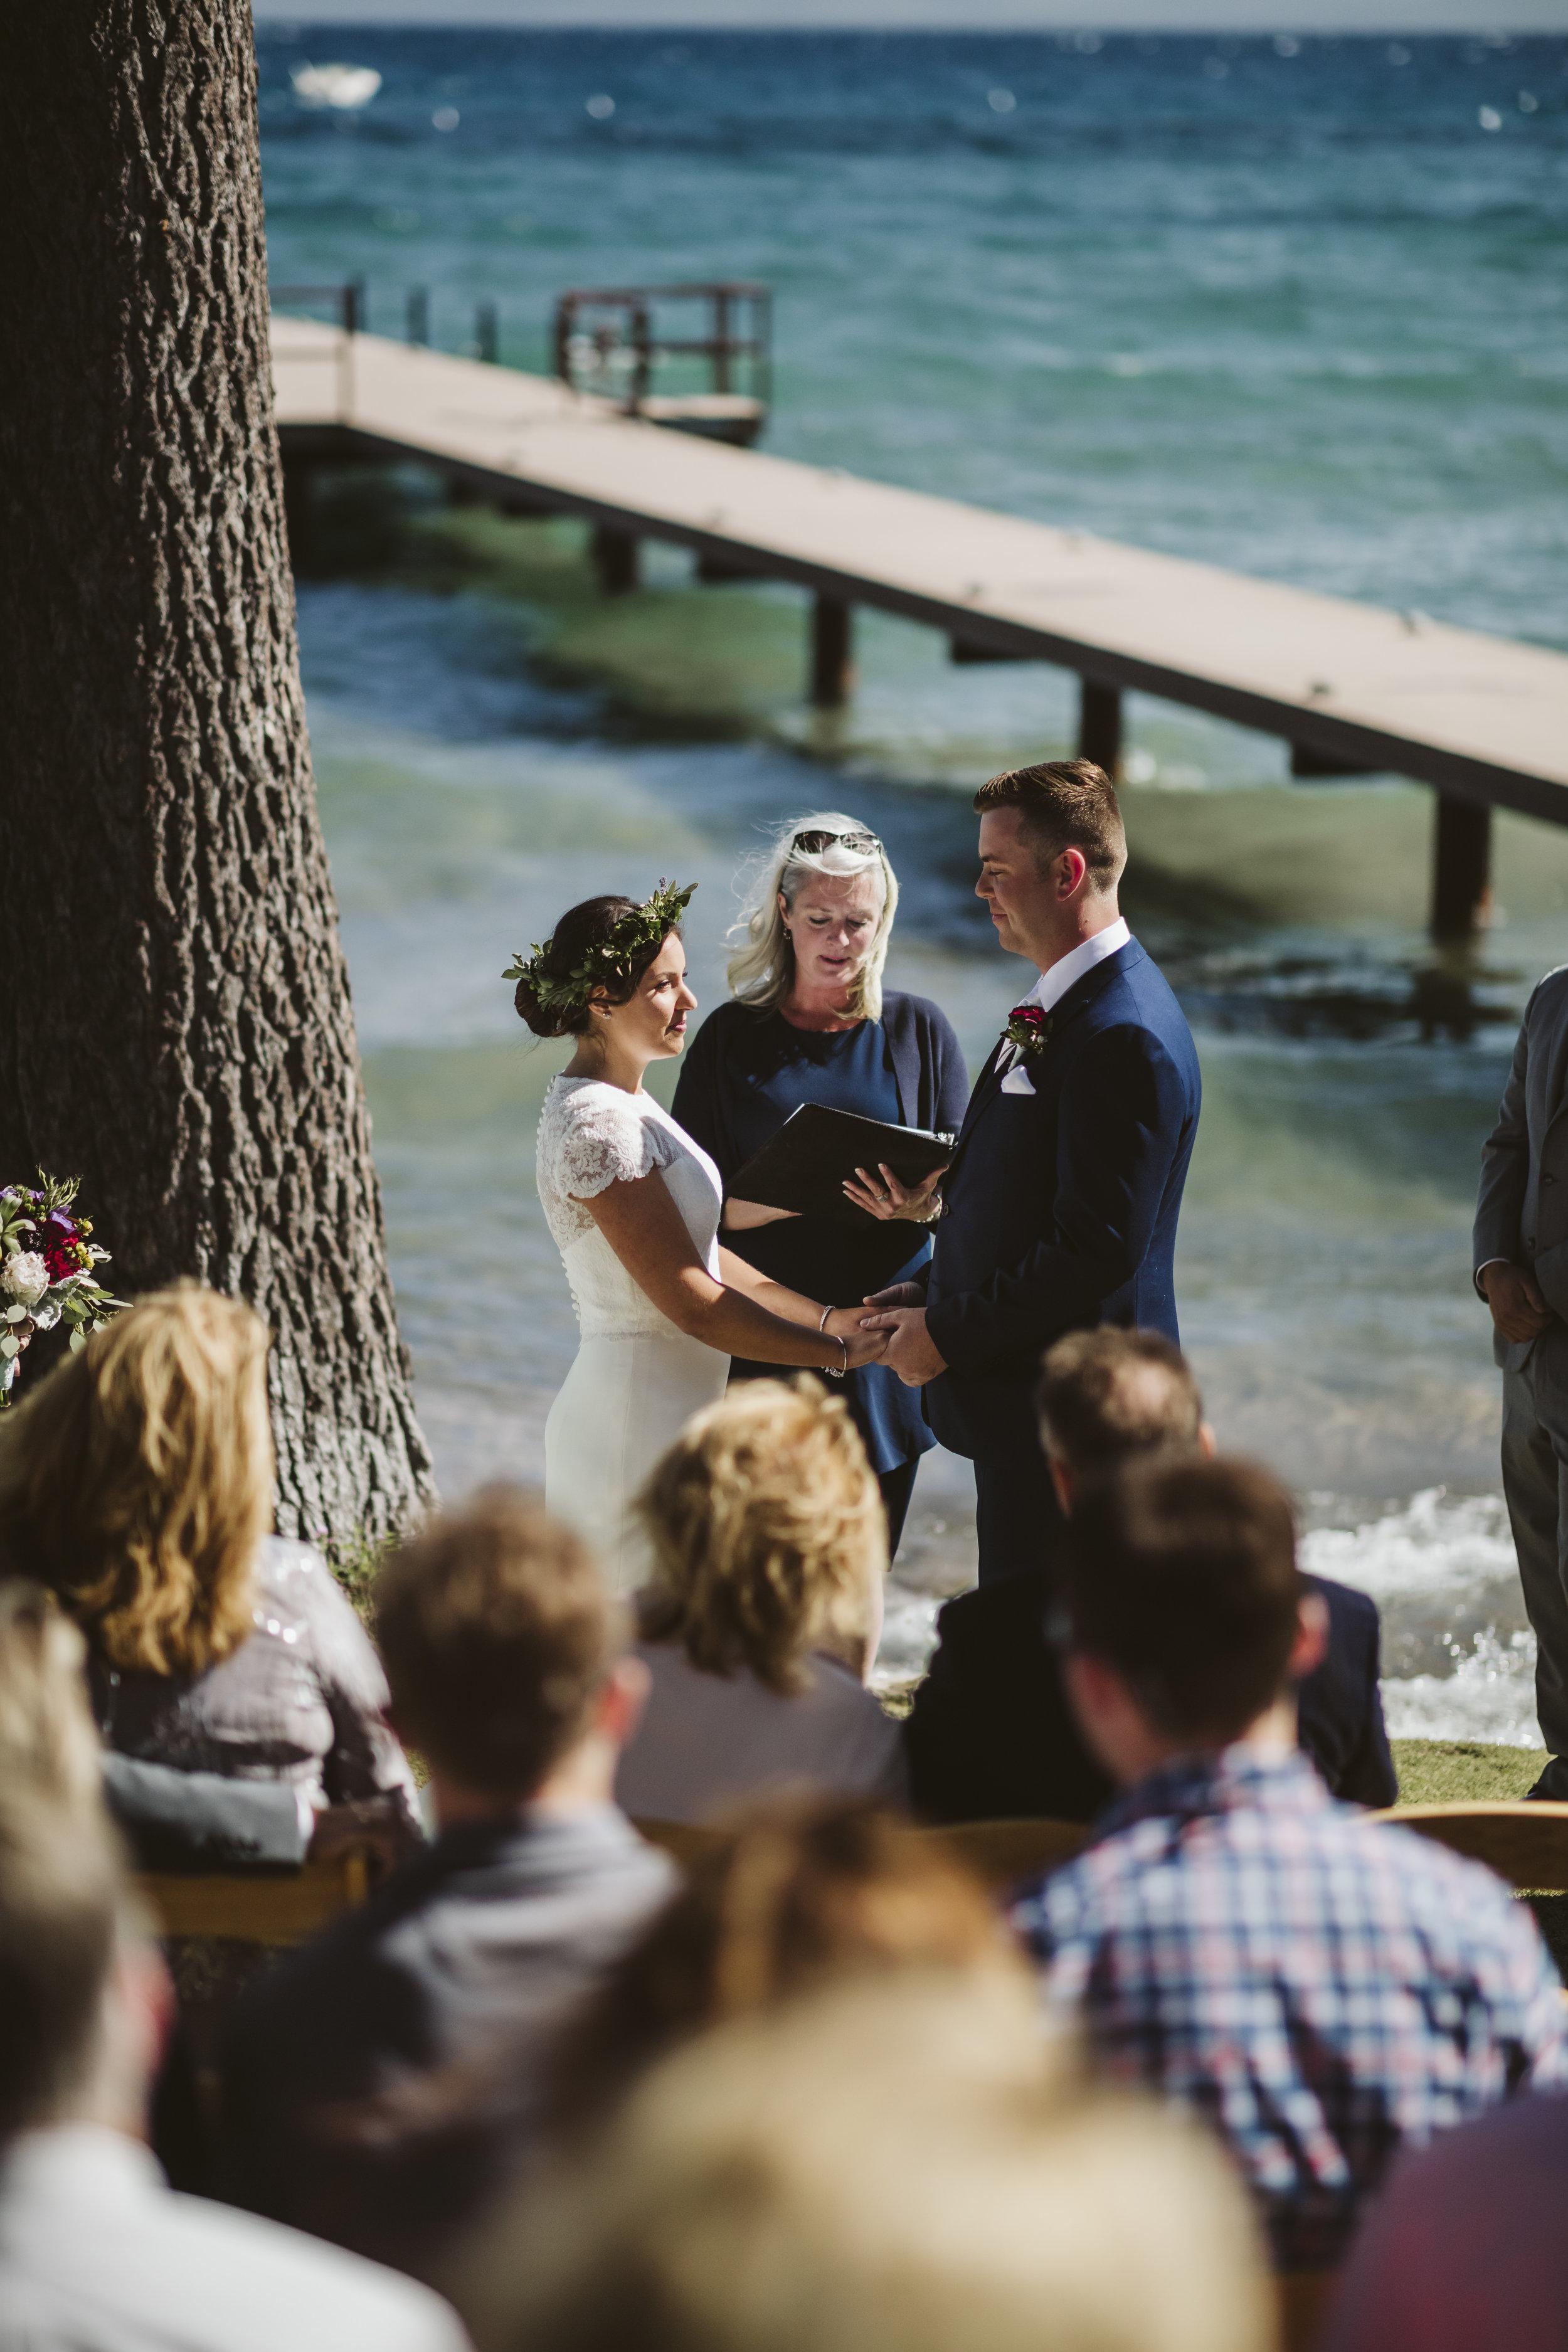 _P8A3451vildphotography-photography-wedding-weddingphotography-tahoewedding-tahoeweddingphotographer-adventurewedding-jake-amy.jpg